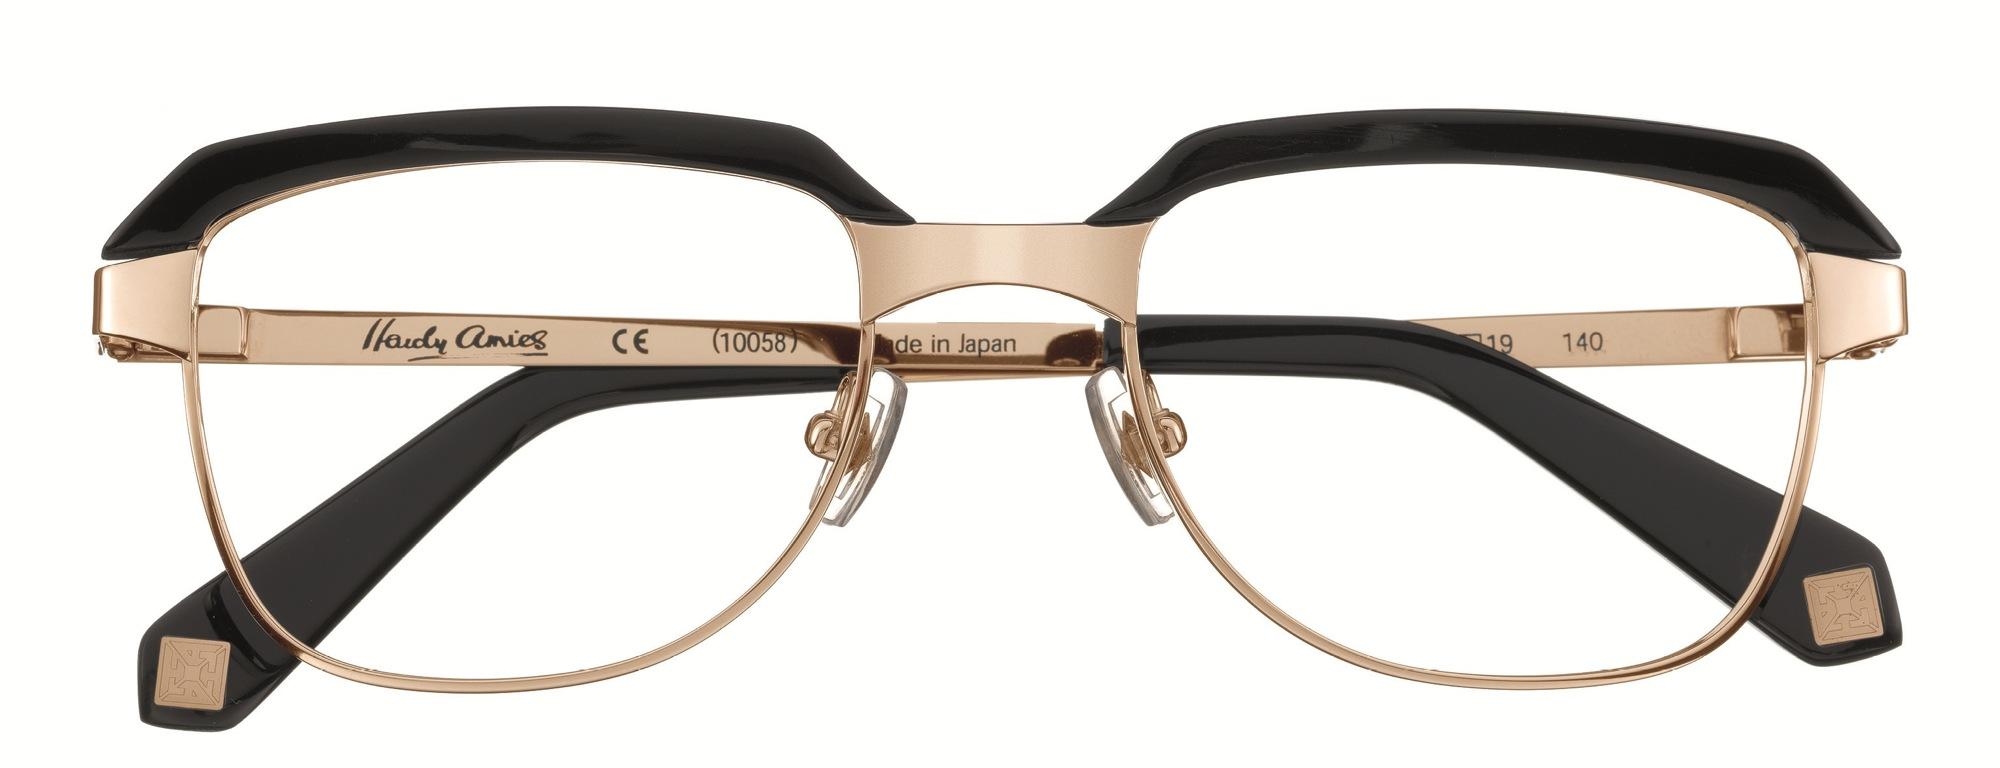 Hardy-Amies-Glasses